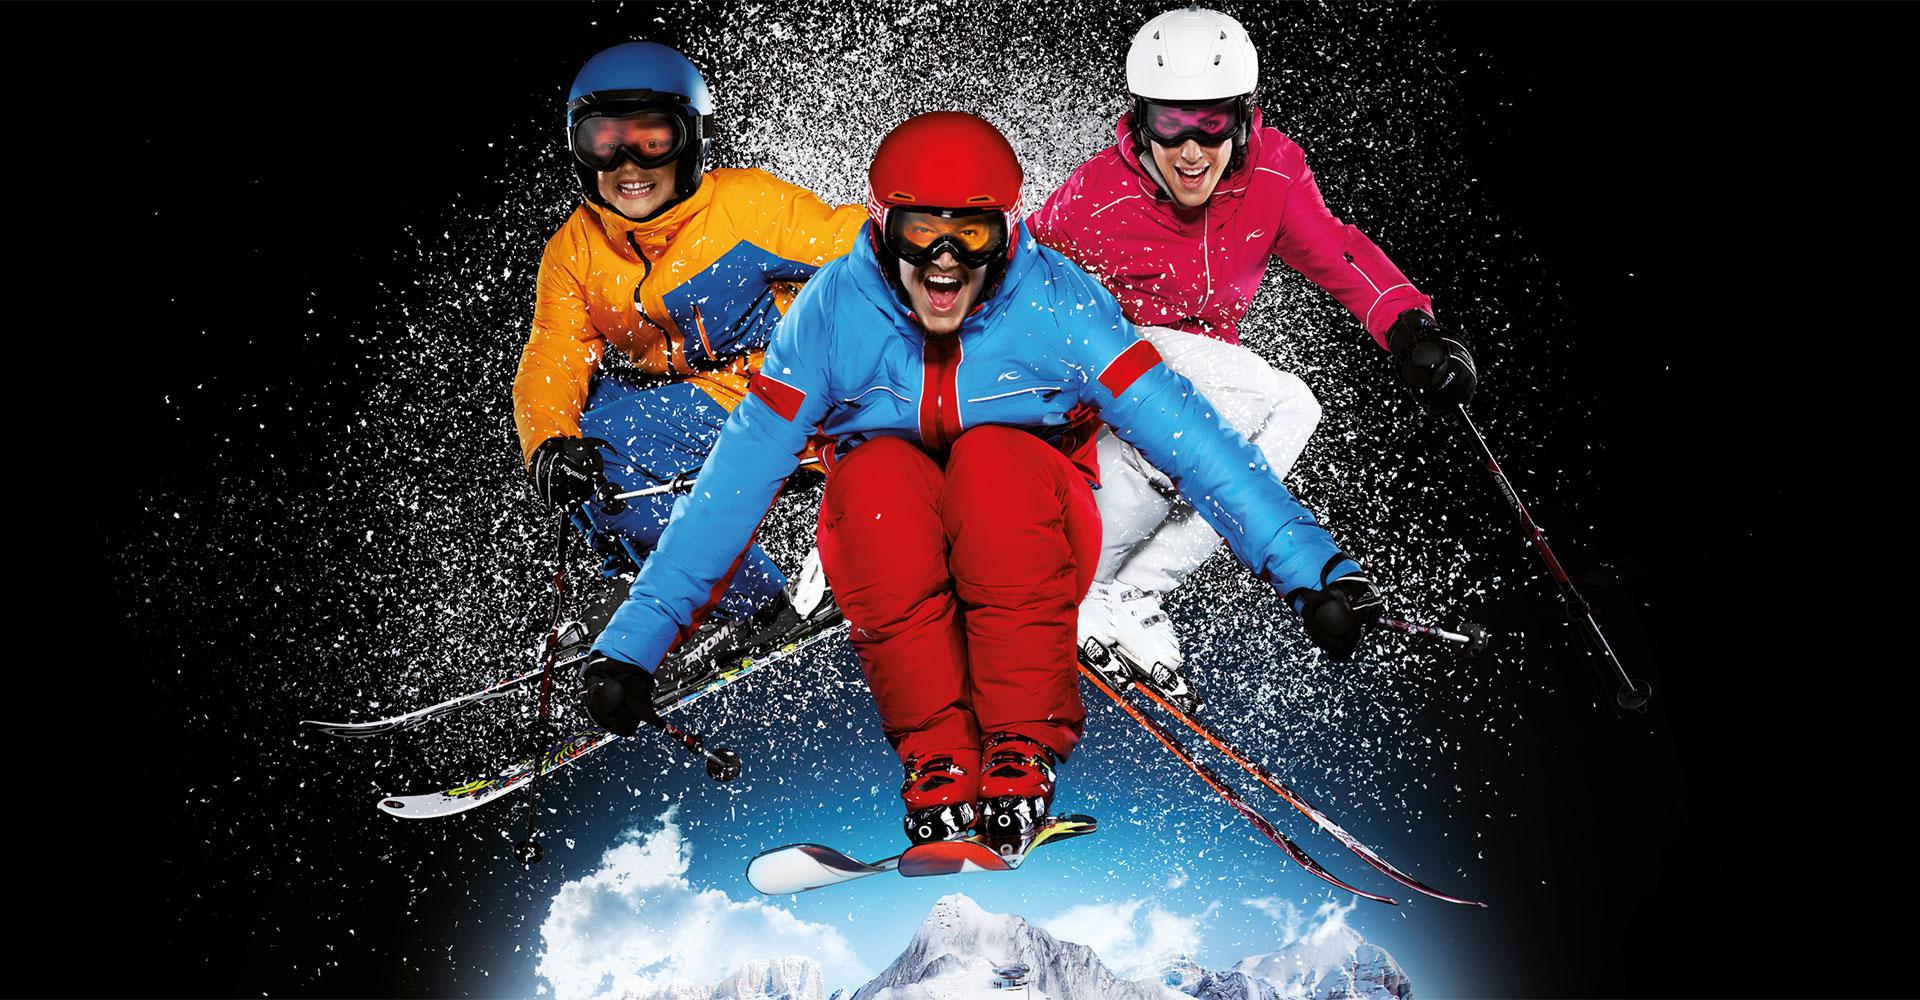 Advertising Winter 2015/2016